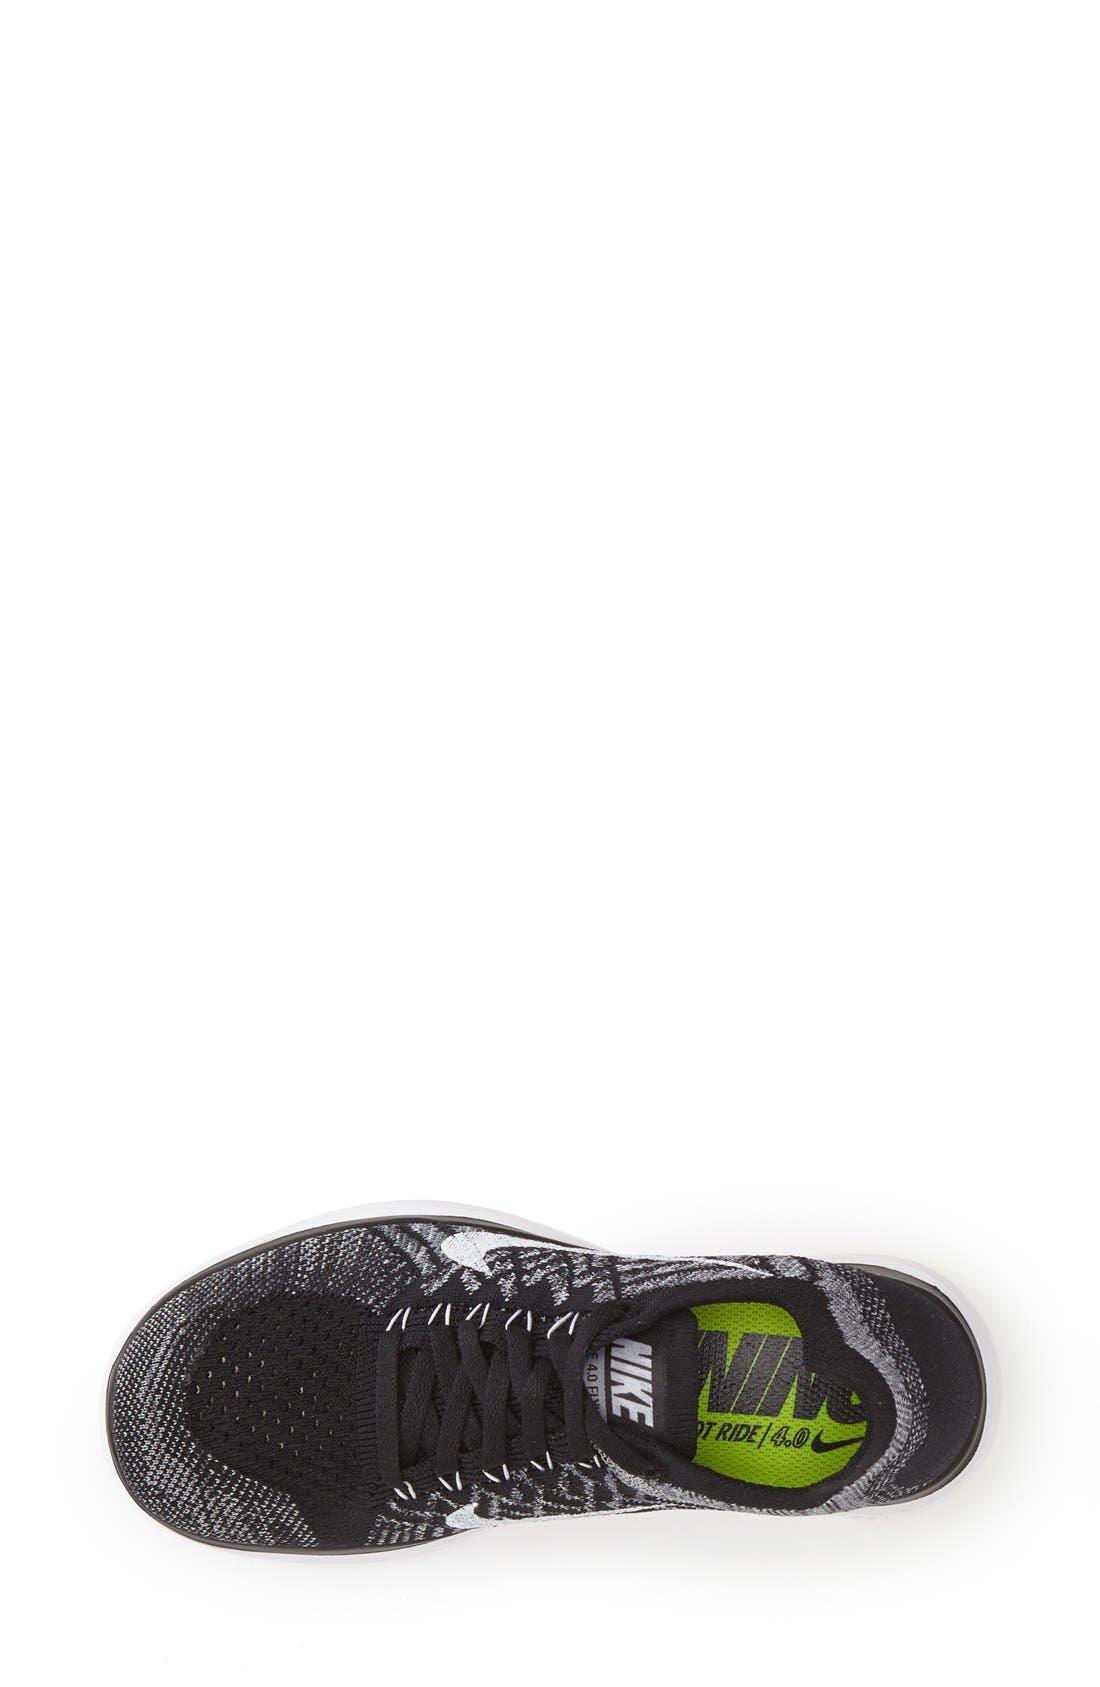 NIKE, 'Free 4.0 Flyknit' Running Shoe, Alternate thumbnail 3, color, 001